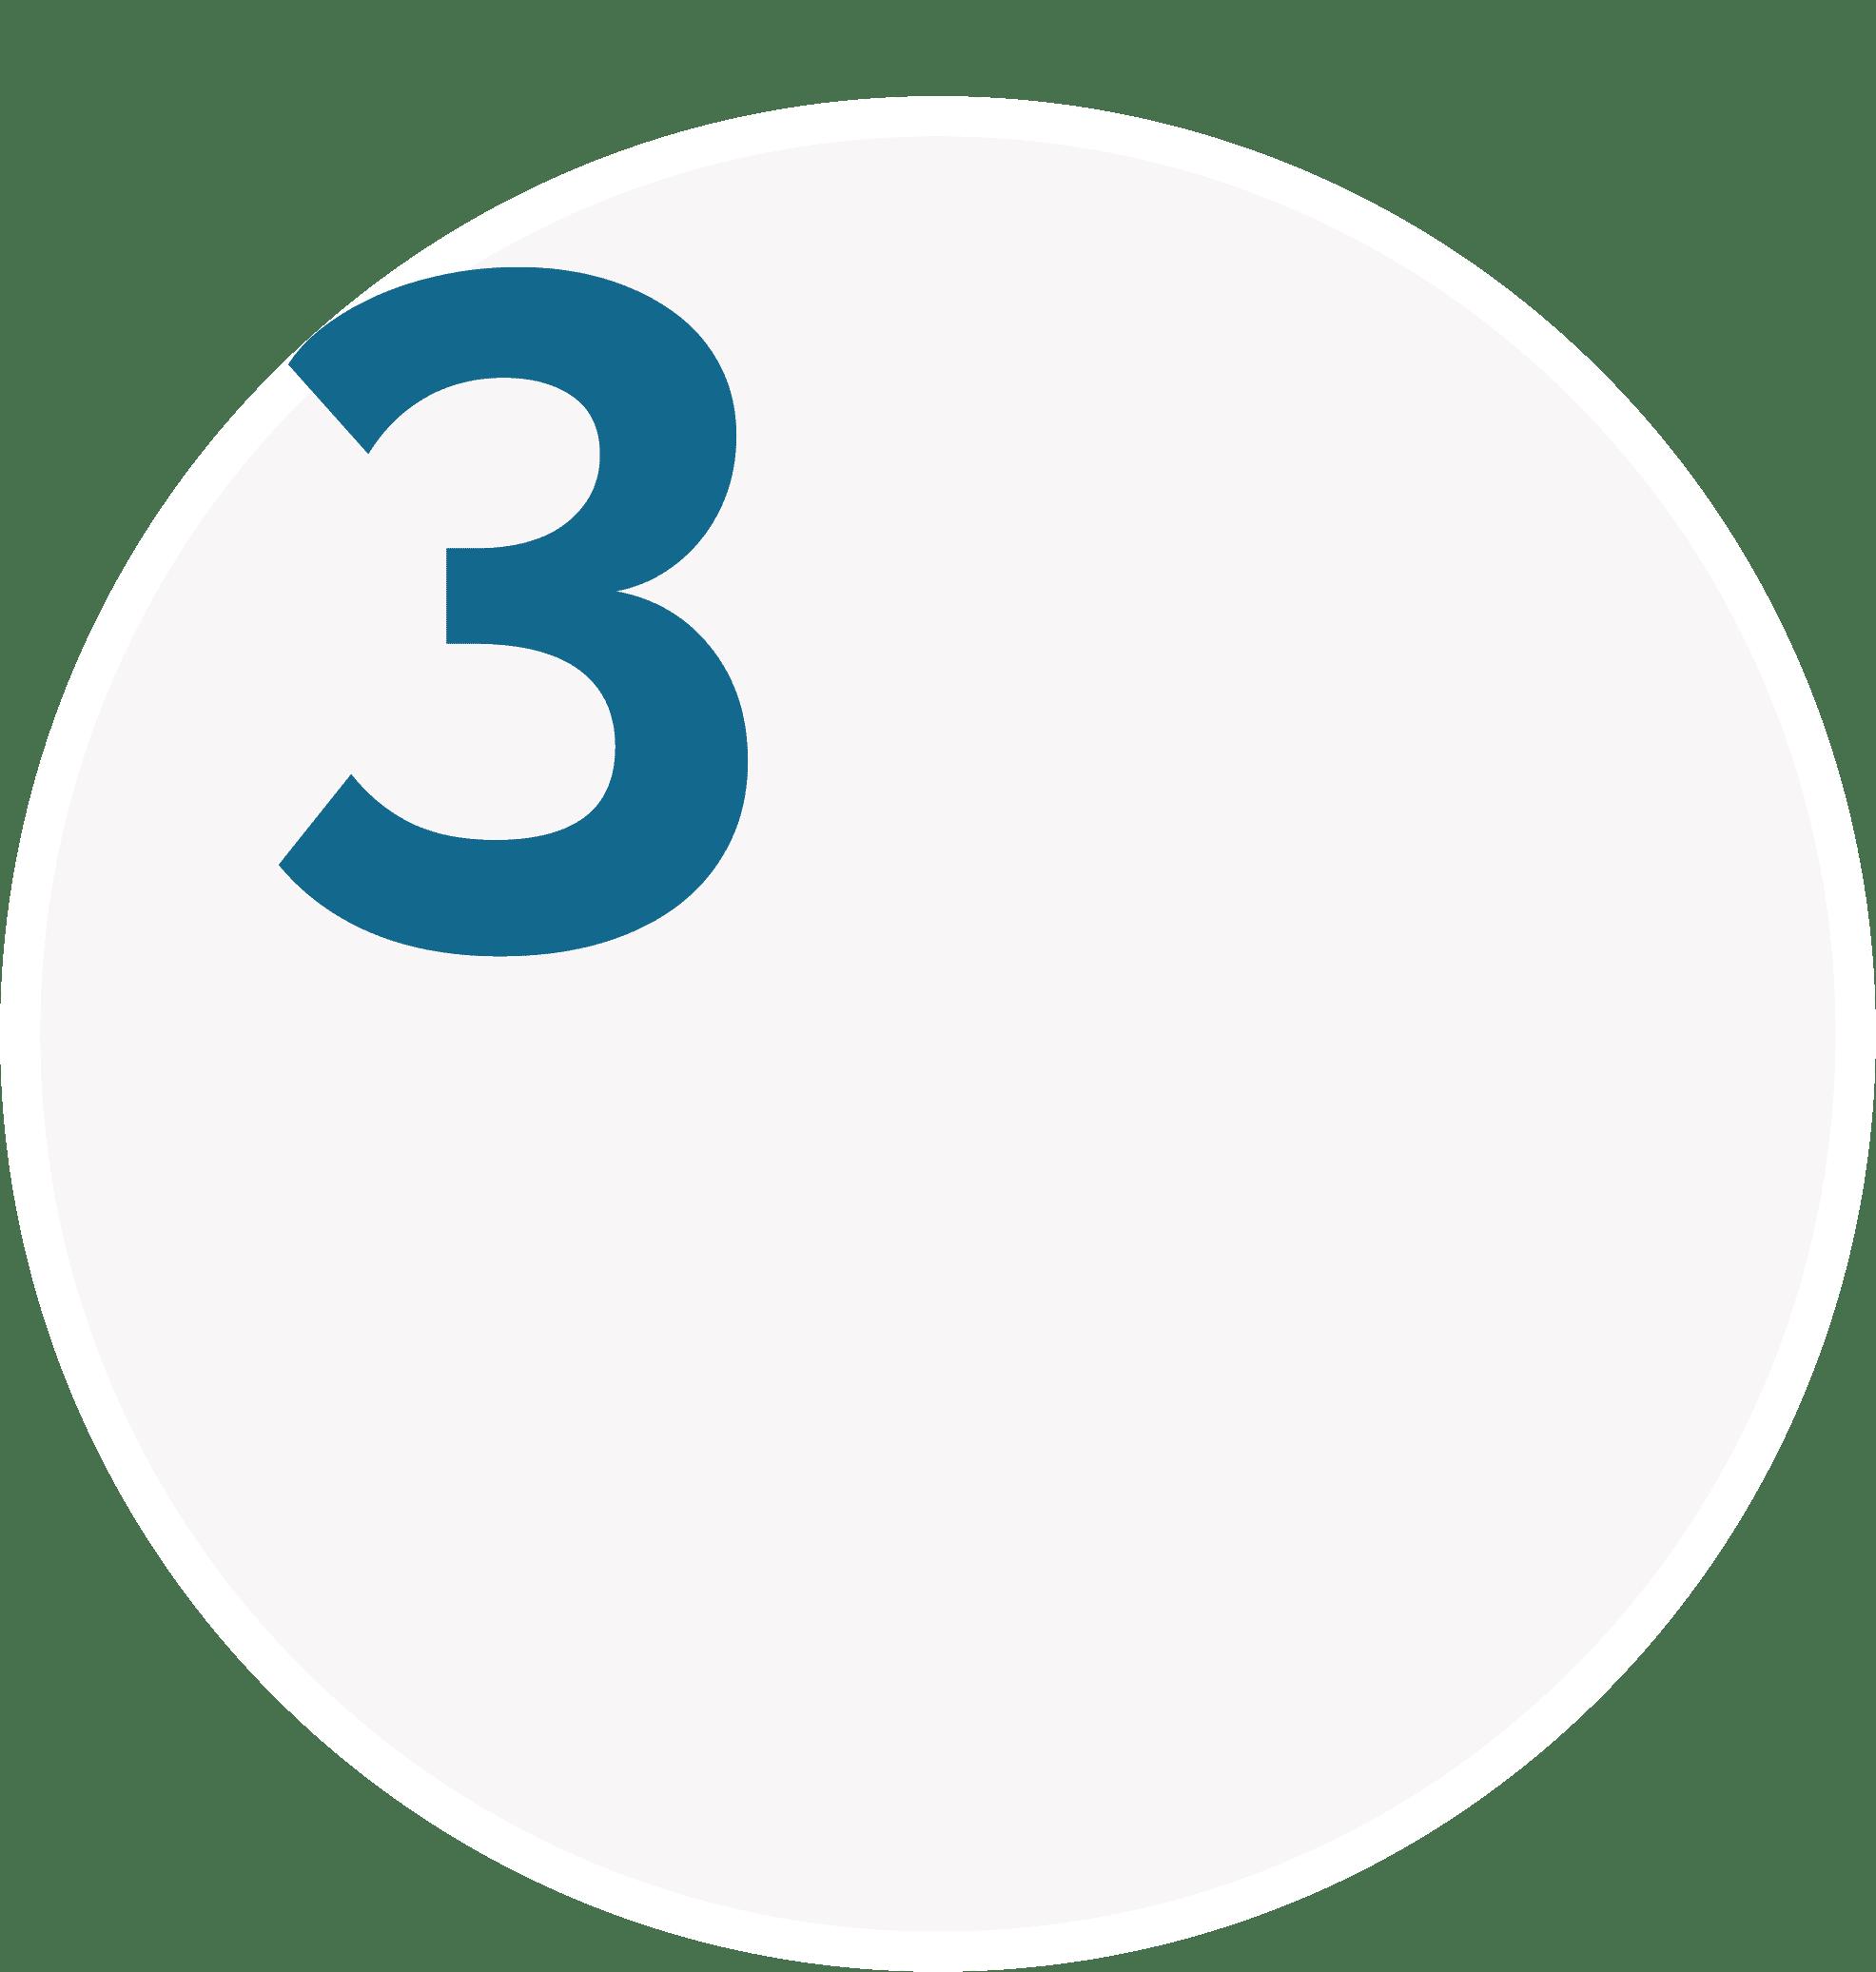 3 3 - Home